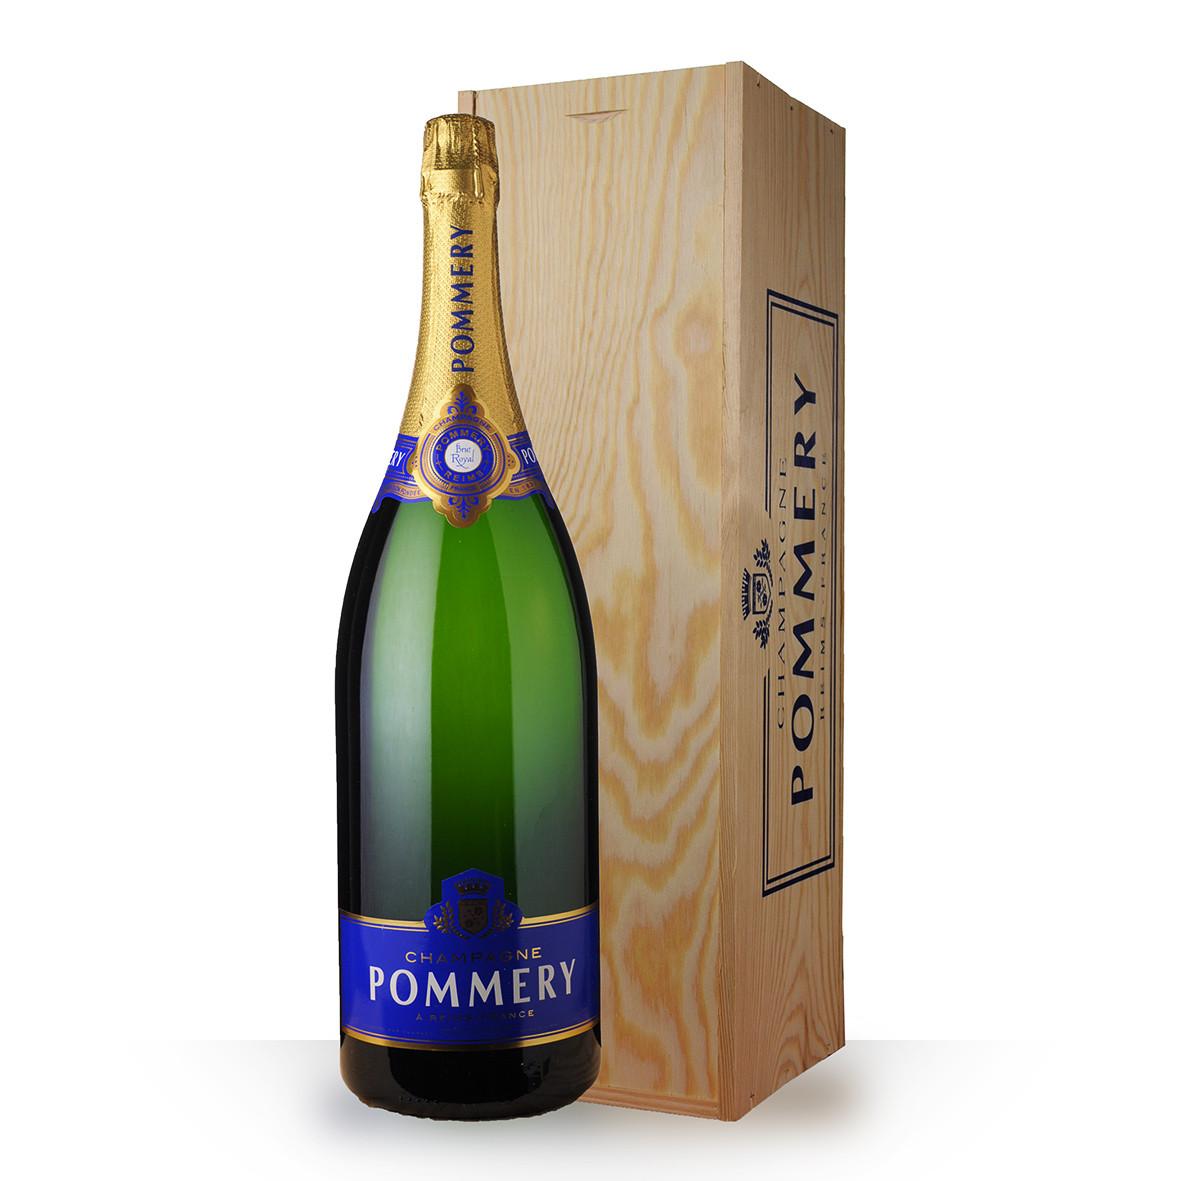 Champagne Pommery Brut Royal 300cl Caisse Bois www.odyssee-vins.com